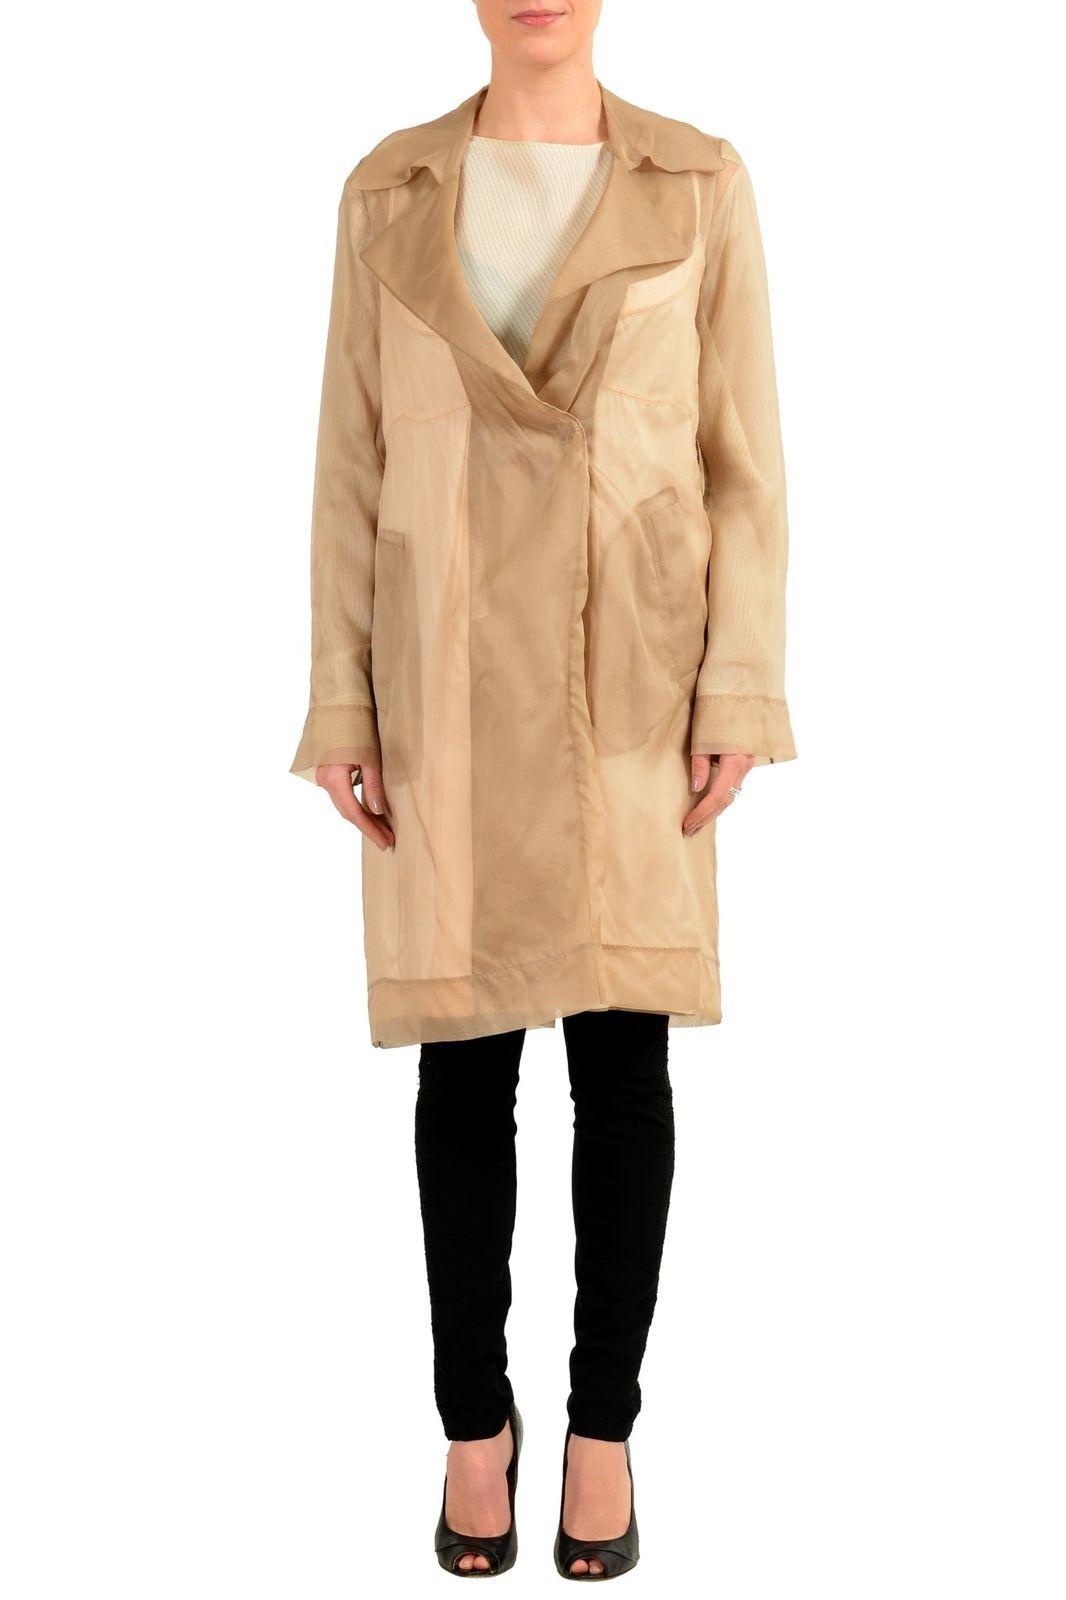 124ec7bf5 Maison Margiela 1 100% Silk Multi-Color Women's Trench Coat